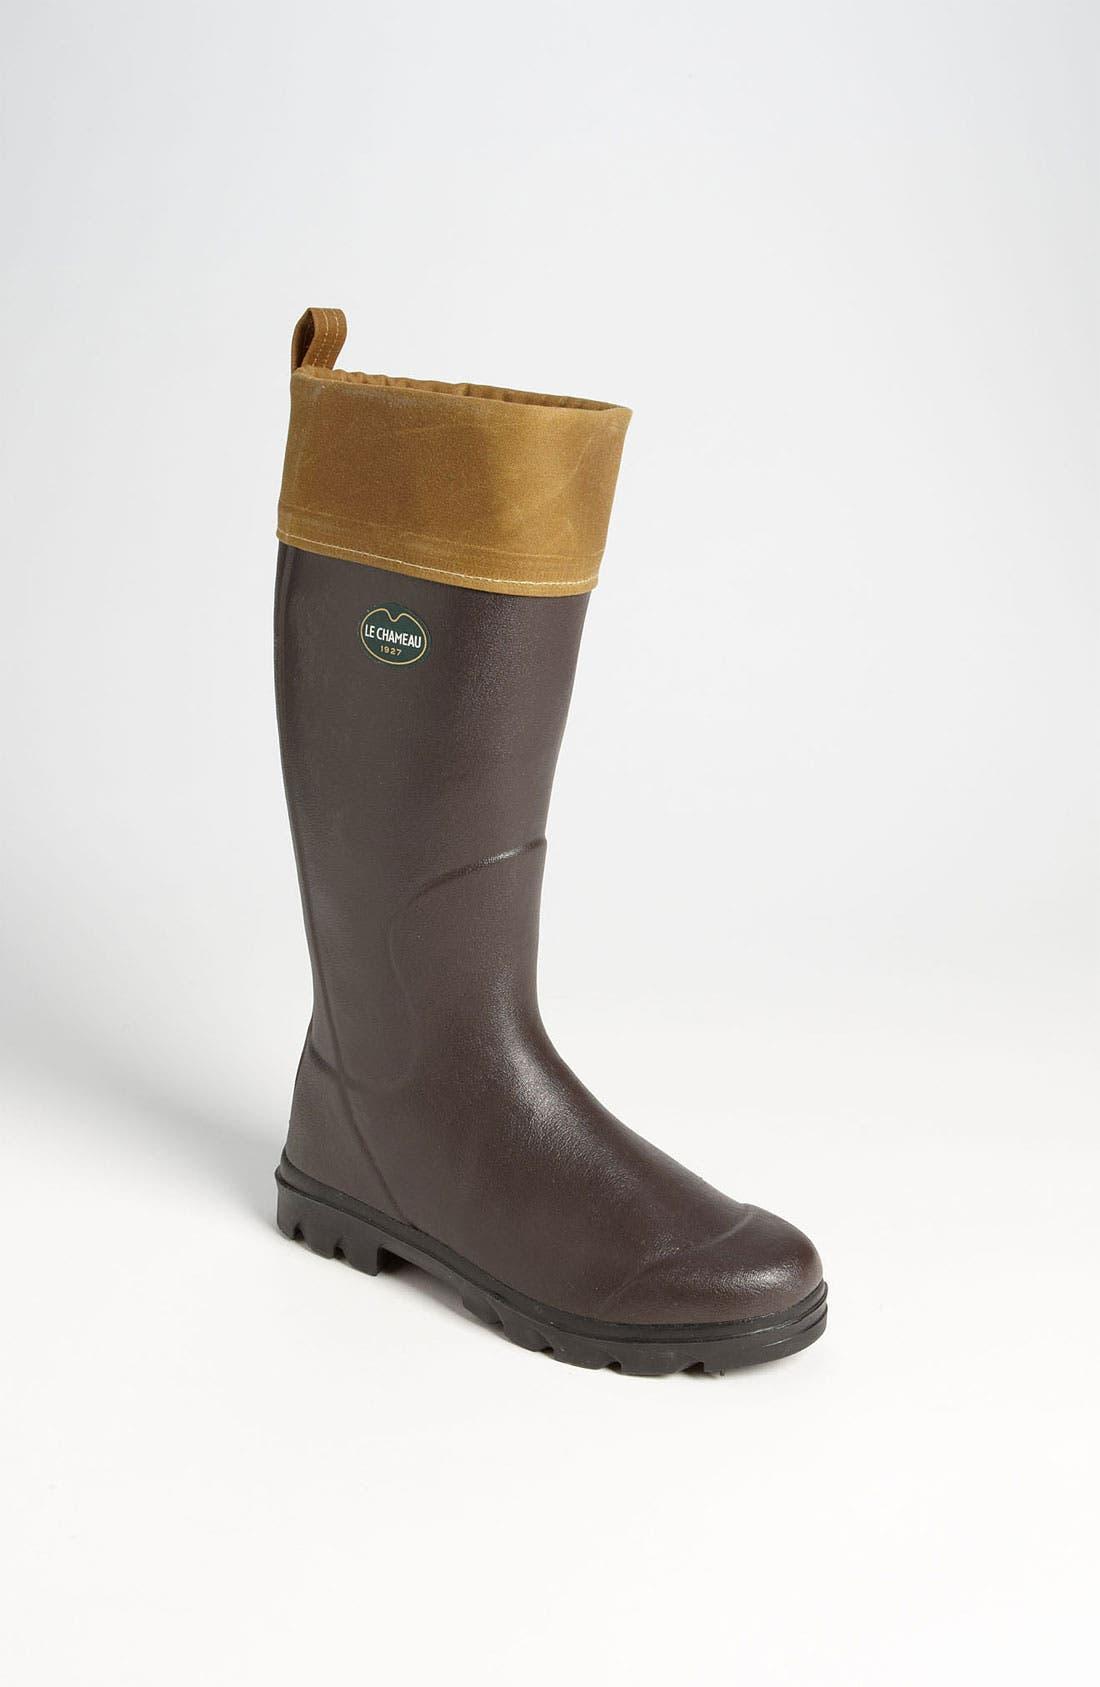 Alternate Image 1 Selected - Le Chameau 'Filson Anjou' Rain Boot (Online Only)